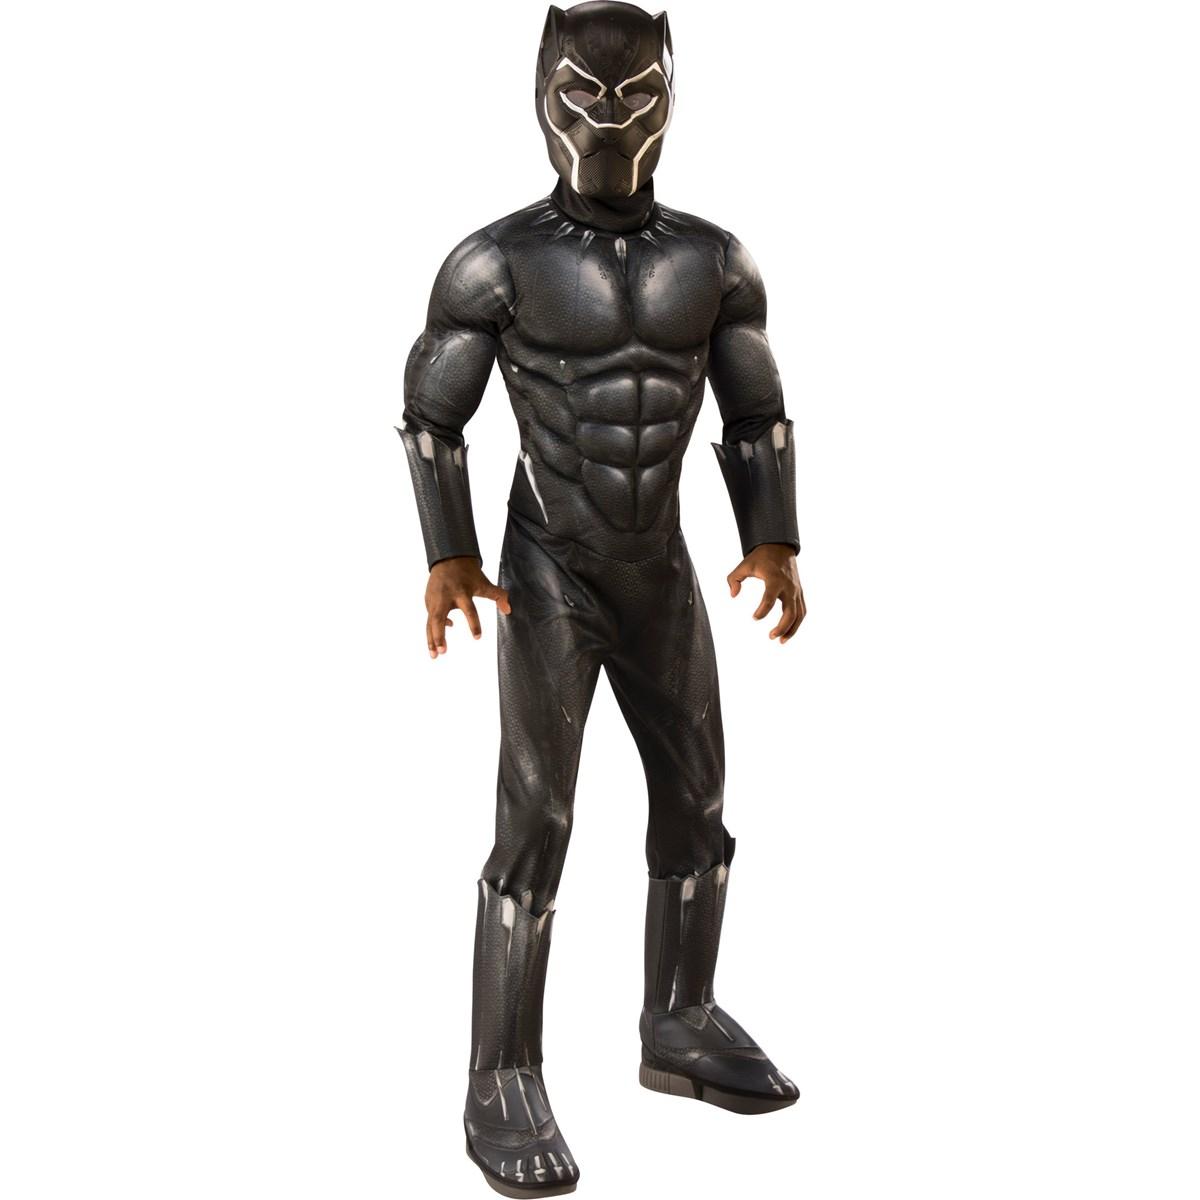 MARVEL -  BLACK PANTHER COSTUME (CHILD) -  BLACK PANTHER